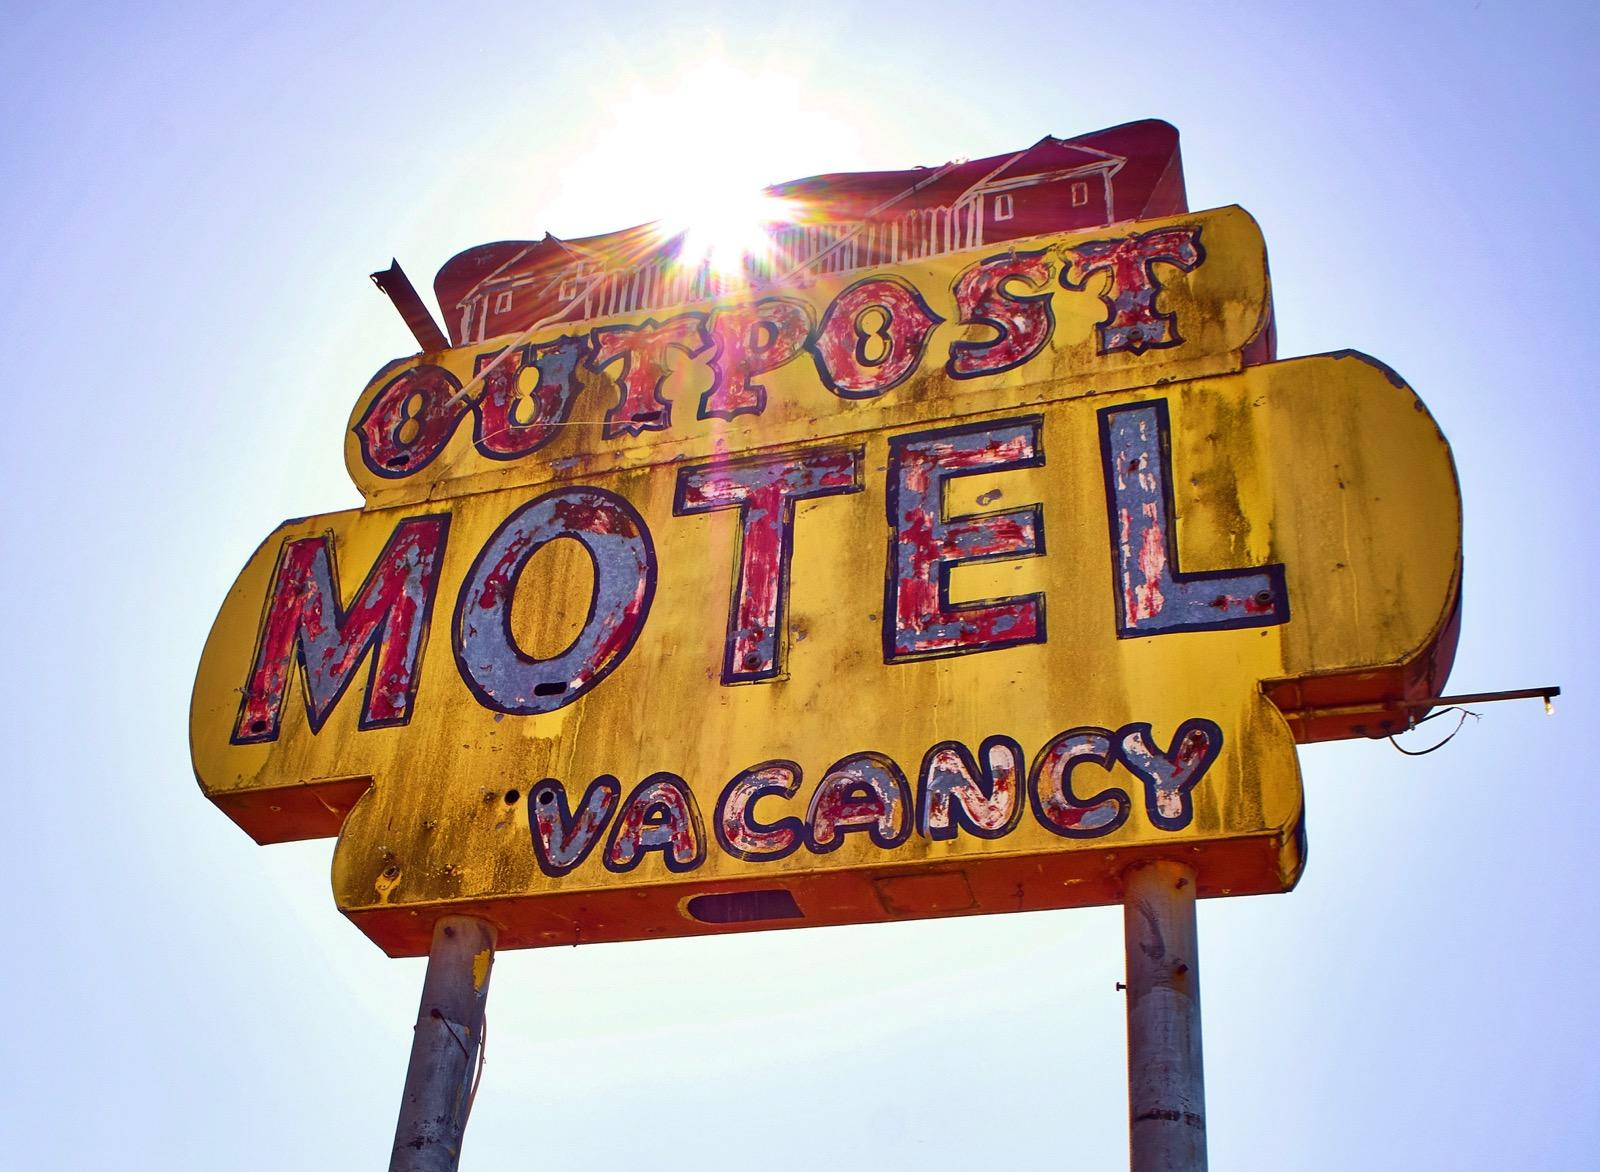 https://thedigitalstory.com/2020/03/31/P9210582-Outpost-Motel-DS.jpg